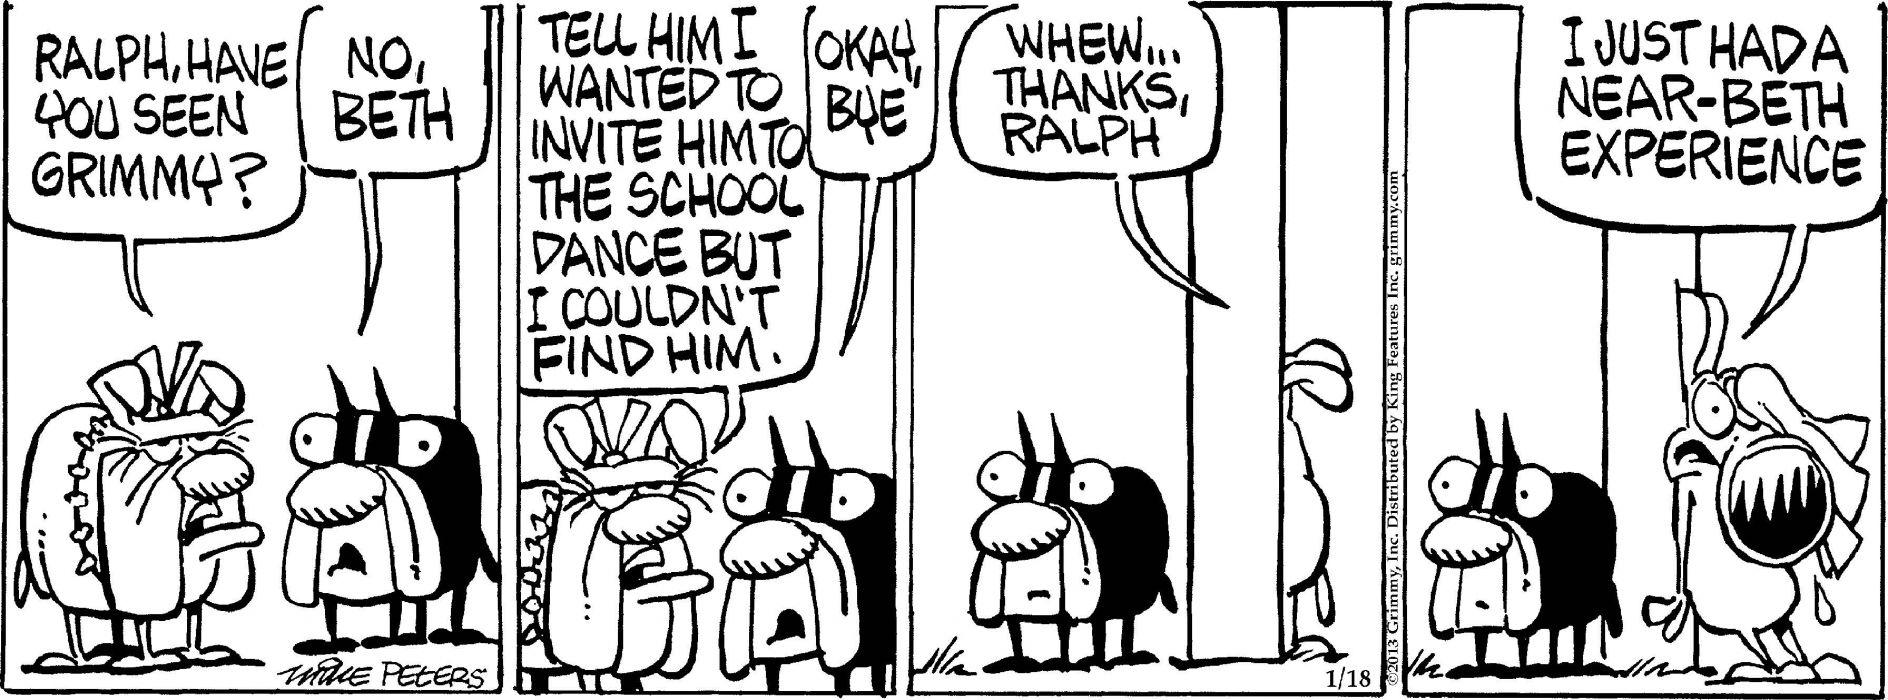 MOTHER-GOOSE-AND-GRIM mother goose grim funny humor comicstrip (1) wallpaper